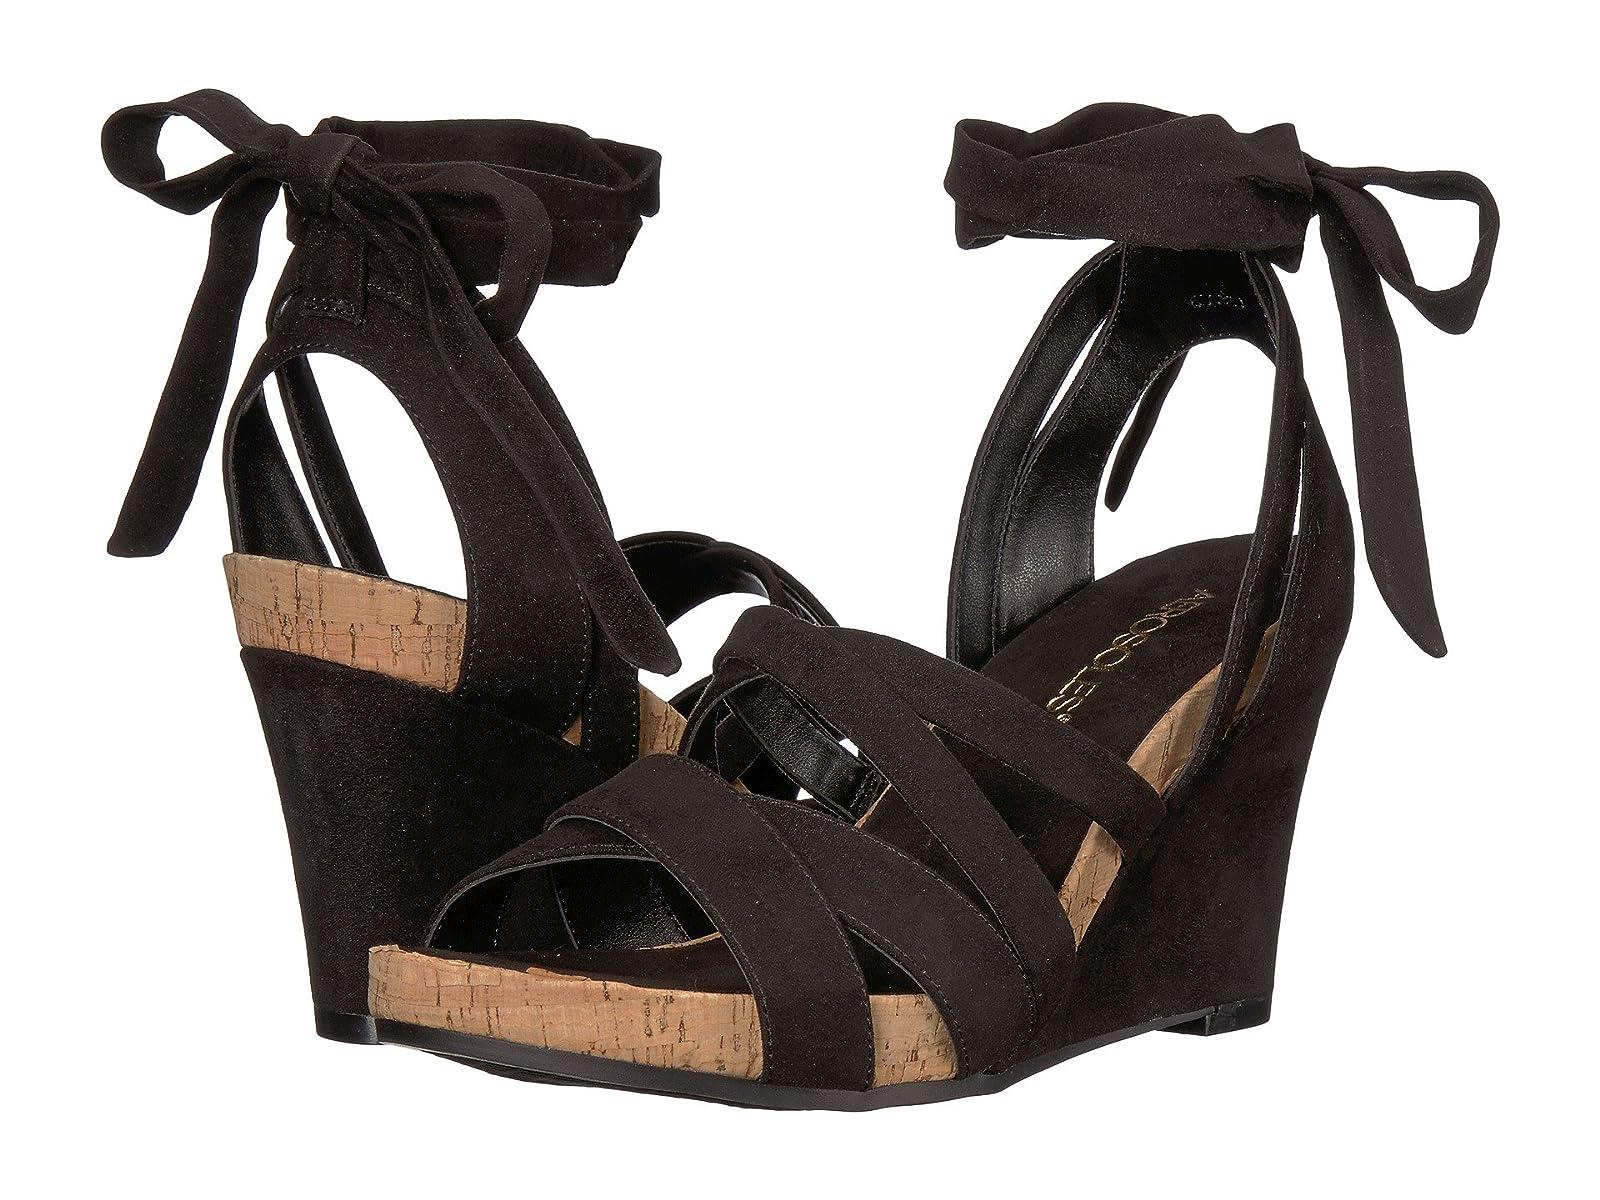 Aerosoles Lilac PlushAtmospheric grades have affordable shoes